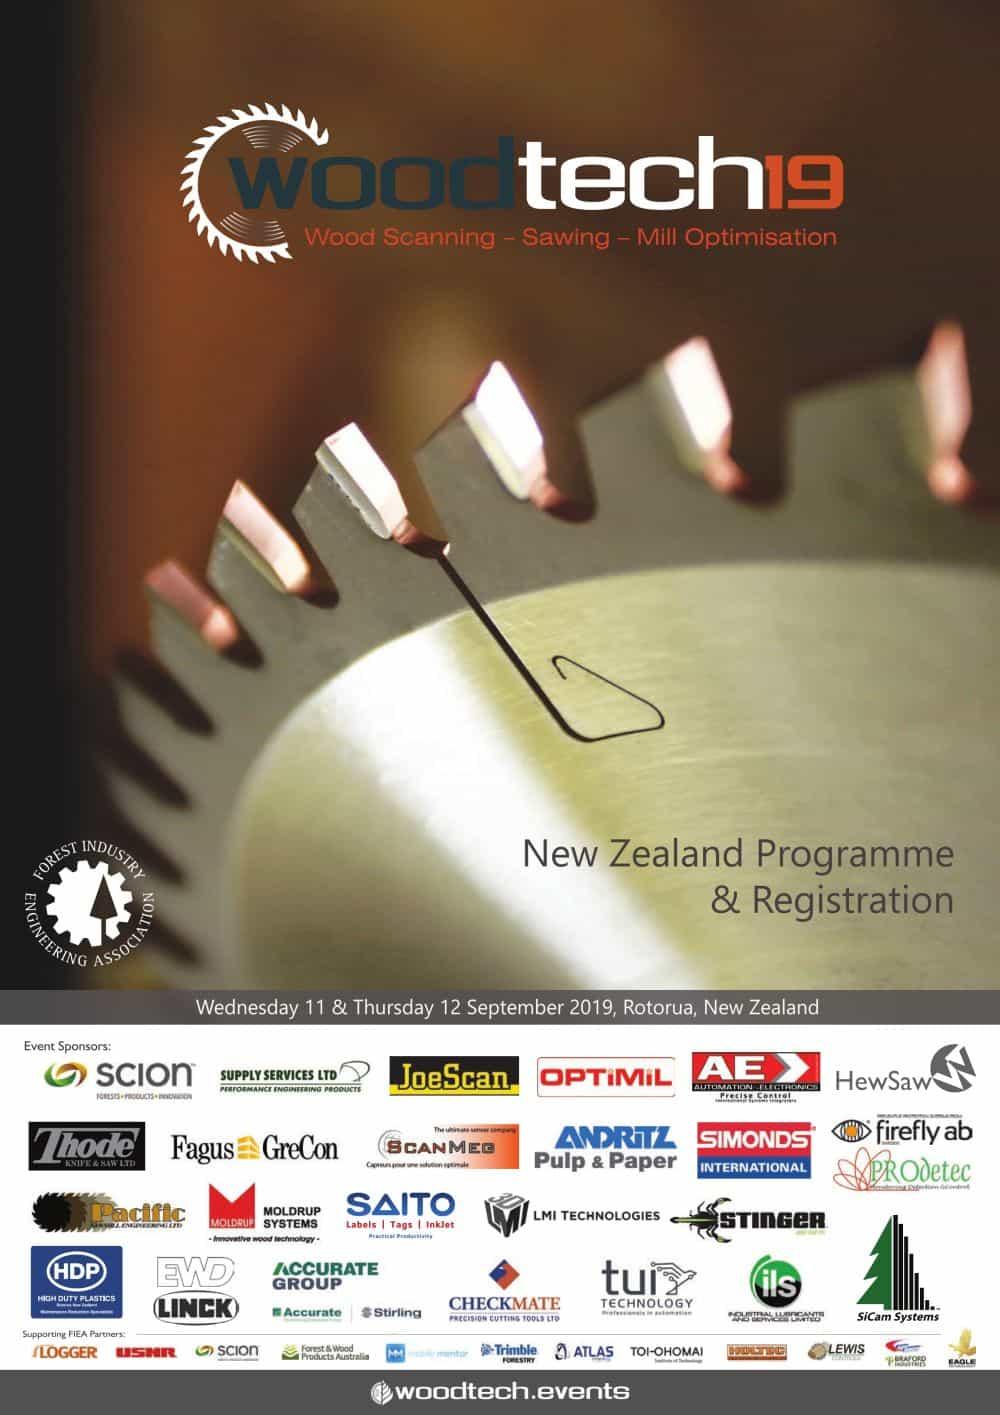 New Zealand WoodTECH 2019 Programme